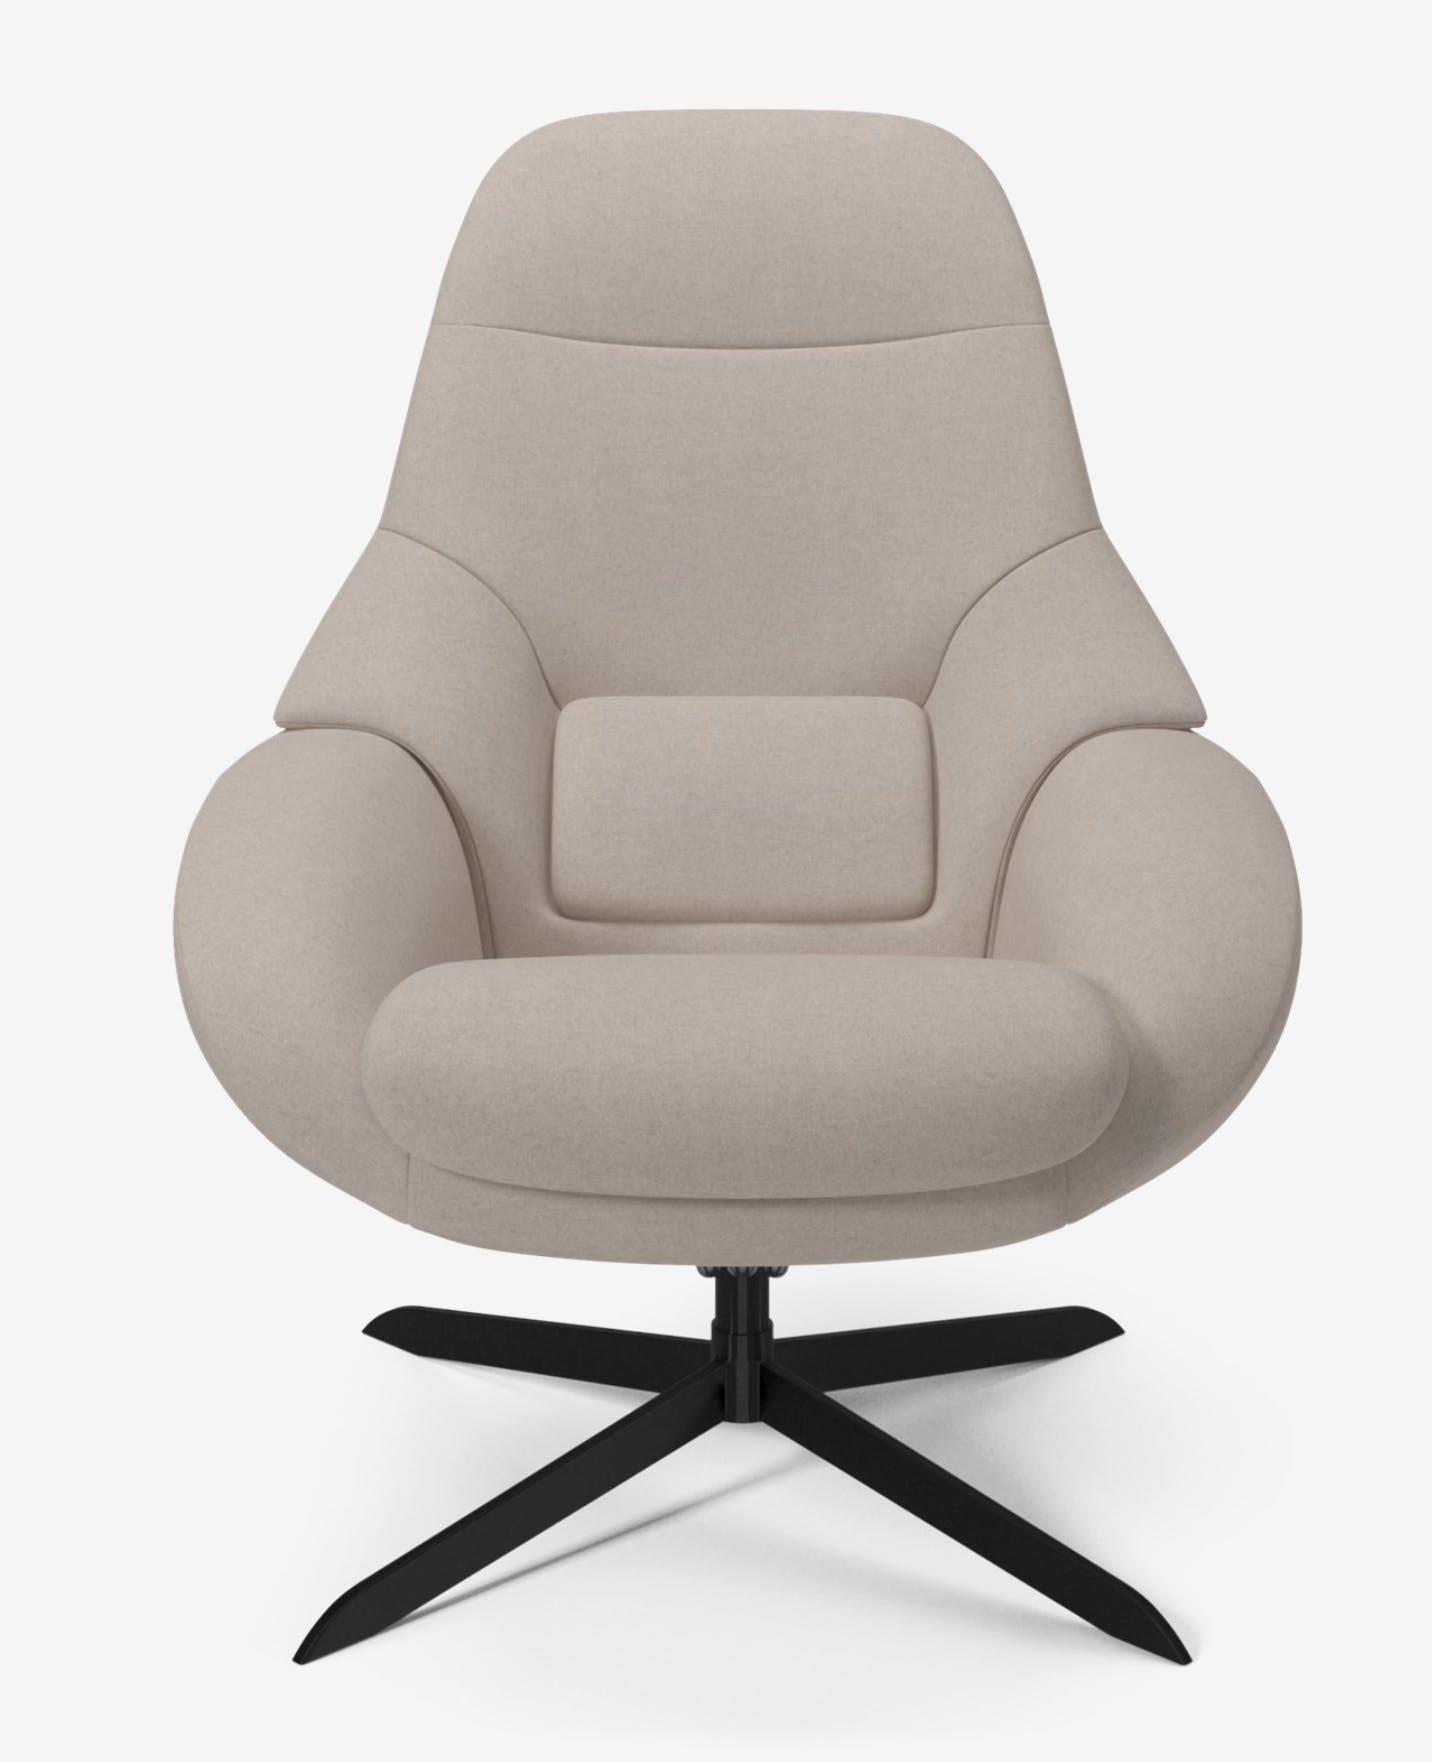 boila-saga-armchair-beige-in-showroom-haute-living